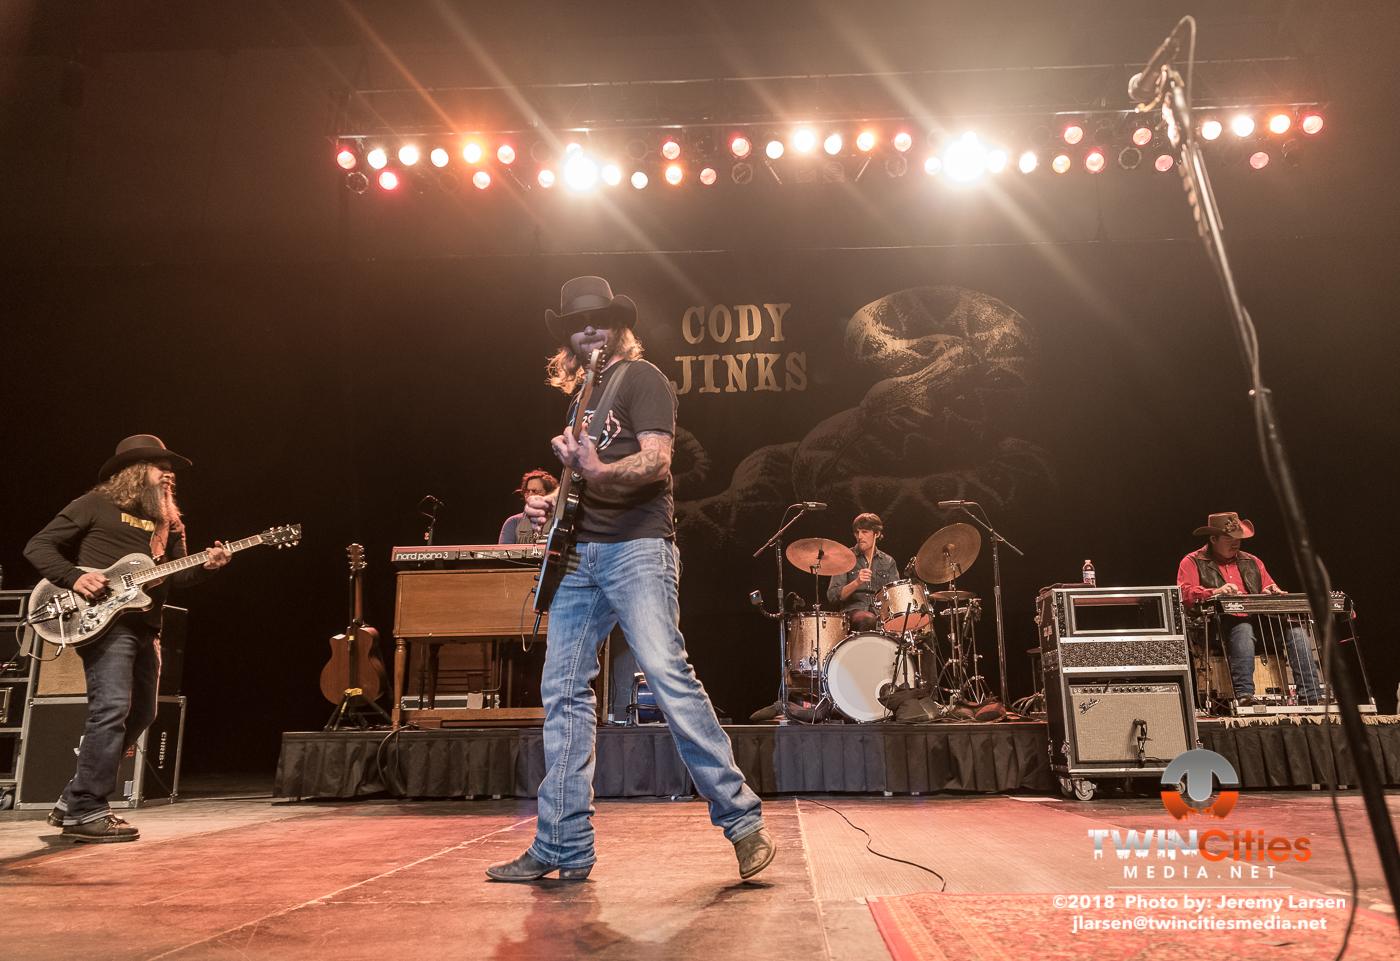 Cody-Jinks-Verizon-Grand-Hall-3-22-19-13